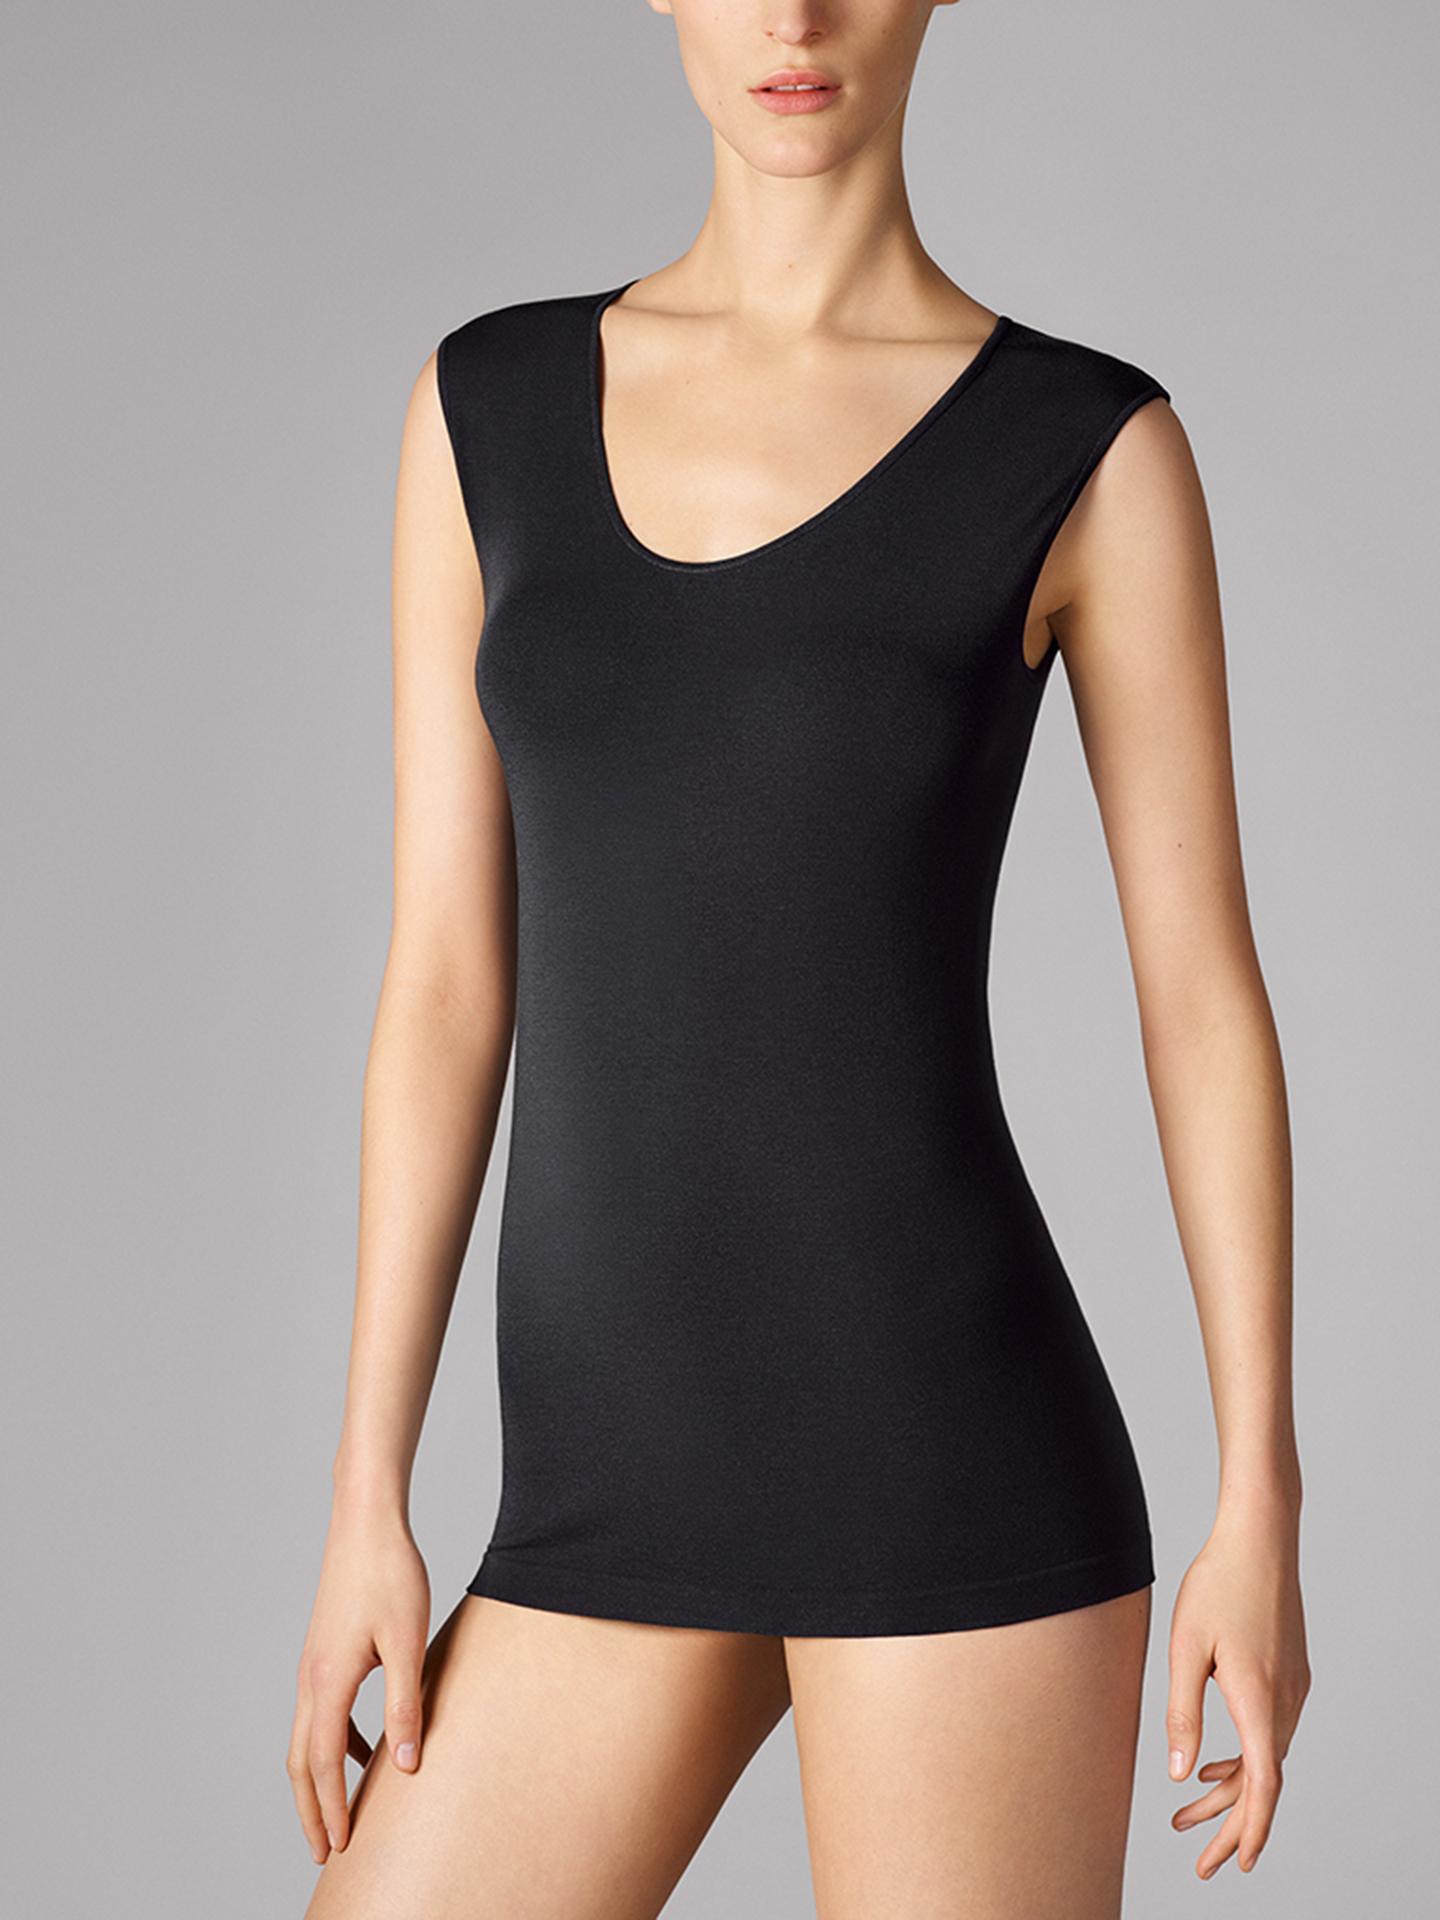 Wolford Apparel & Accessories > Clothing > Abbigliamento Donna Sydney Top